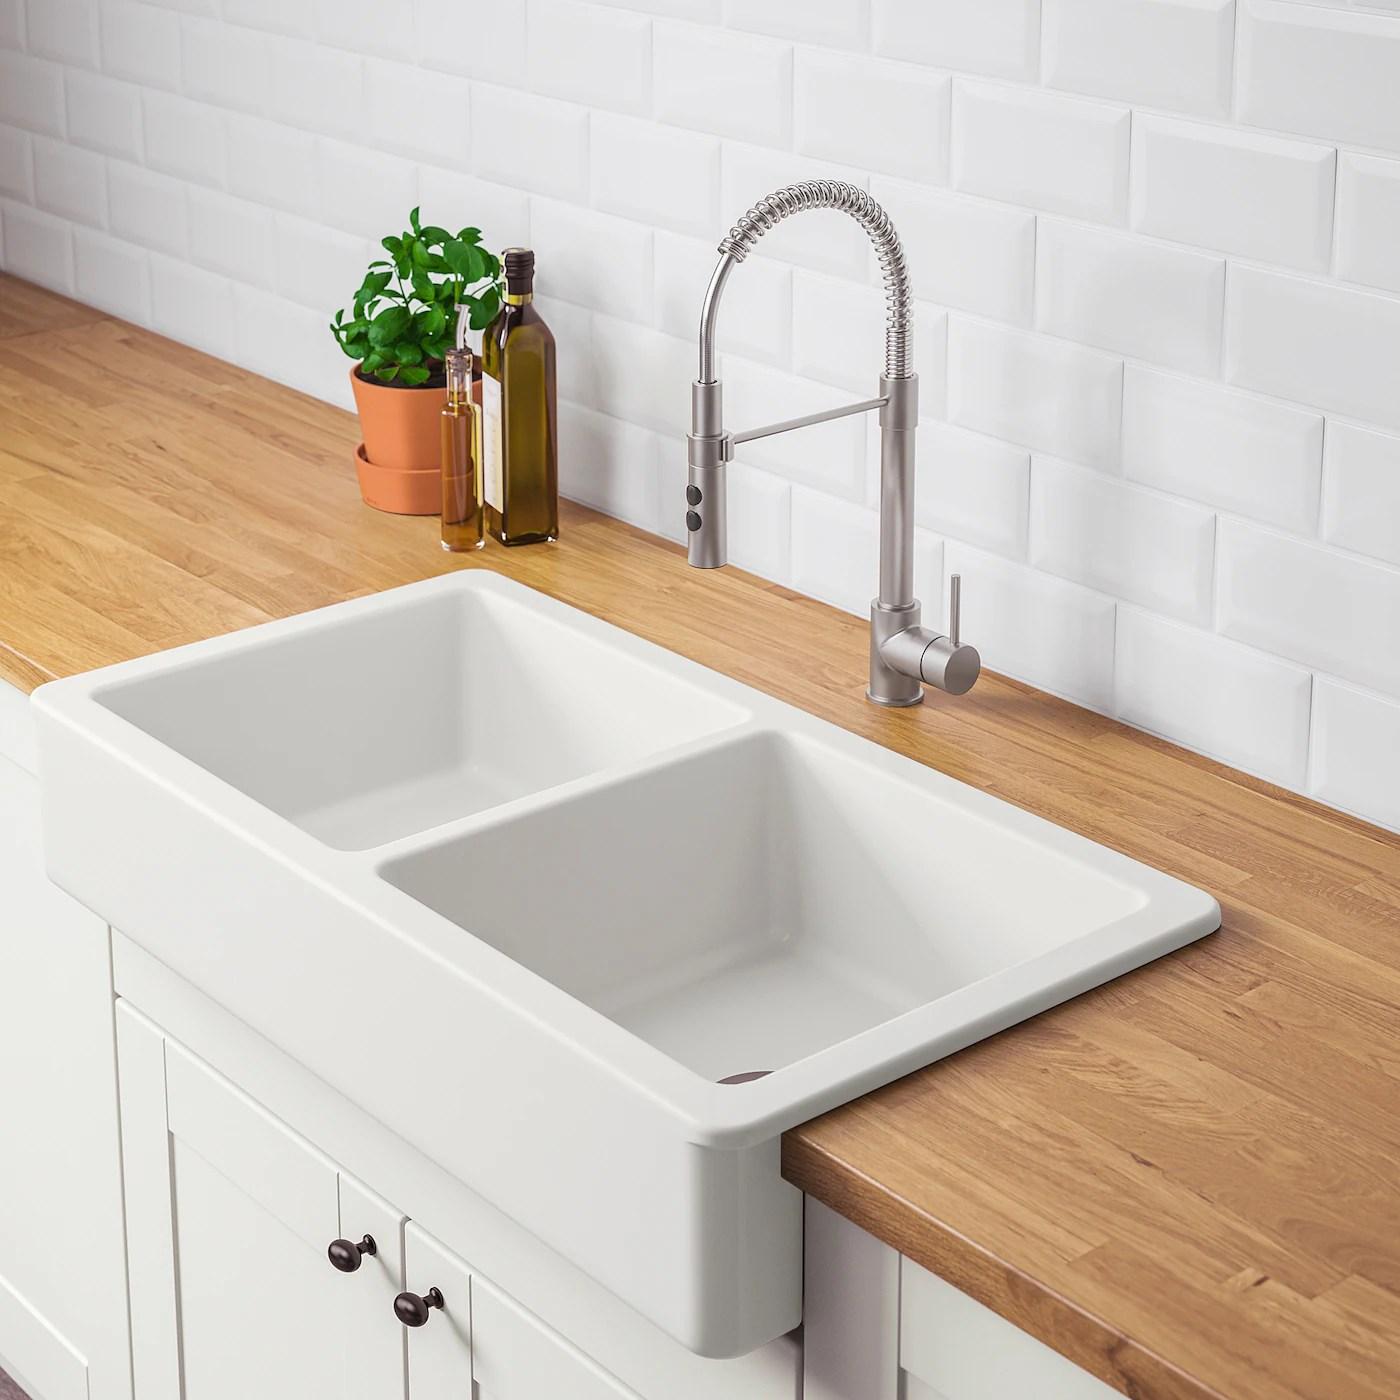 havsen apron front double bowl sink white 37x19 93x48 cm